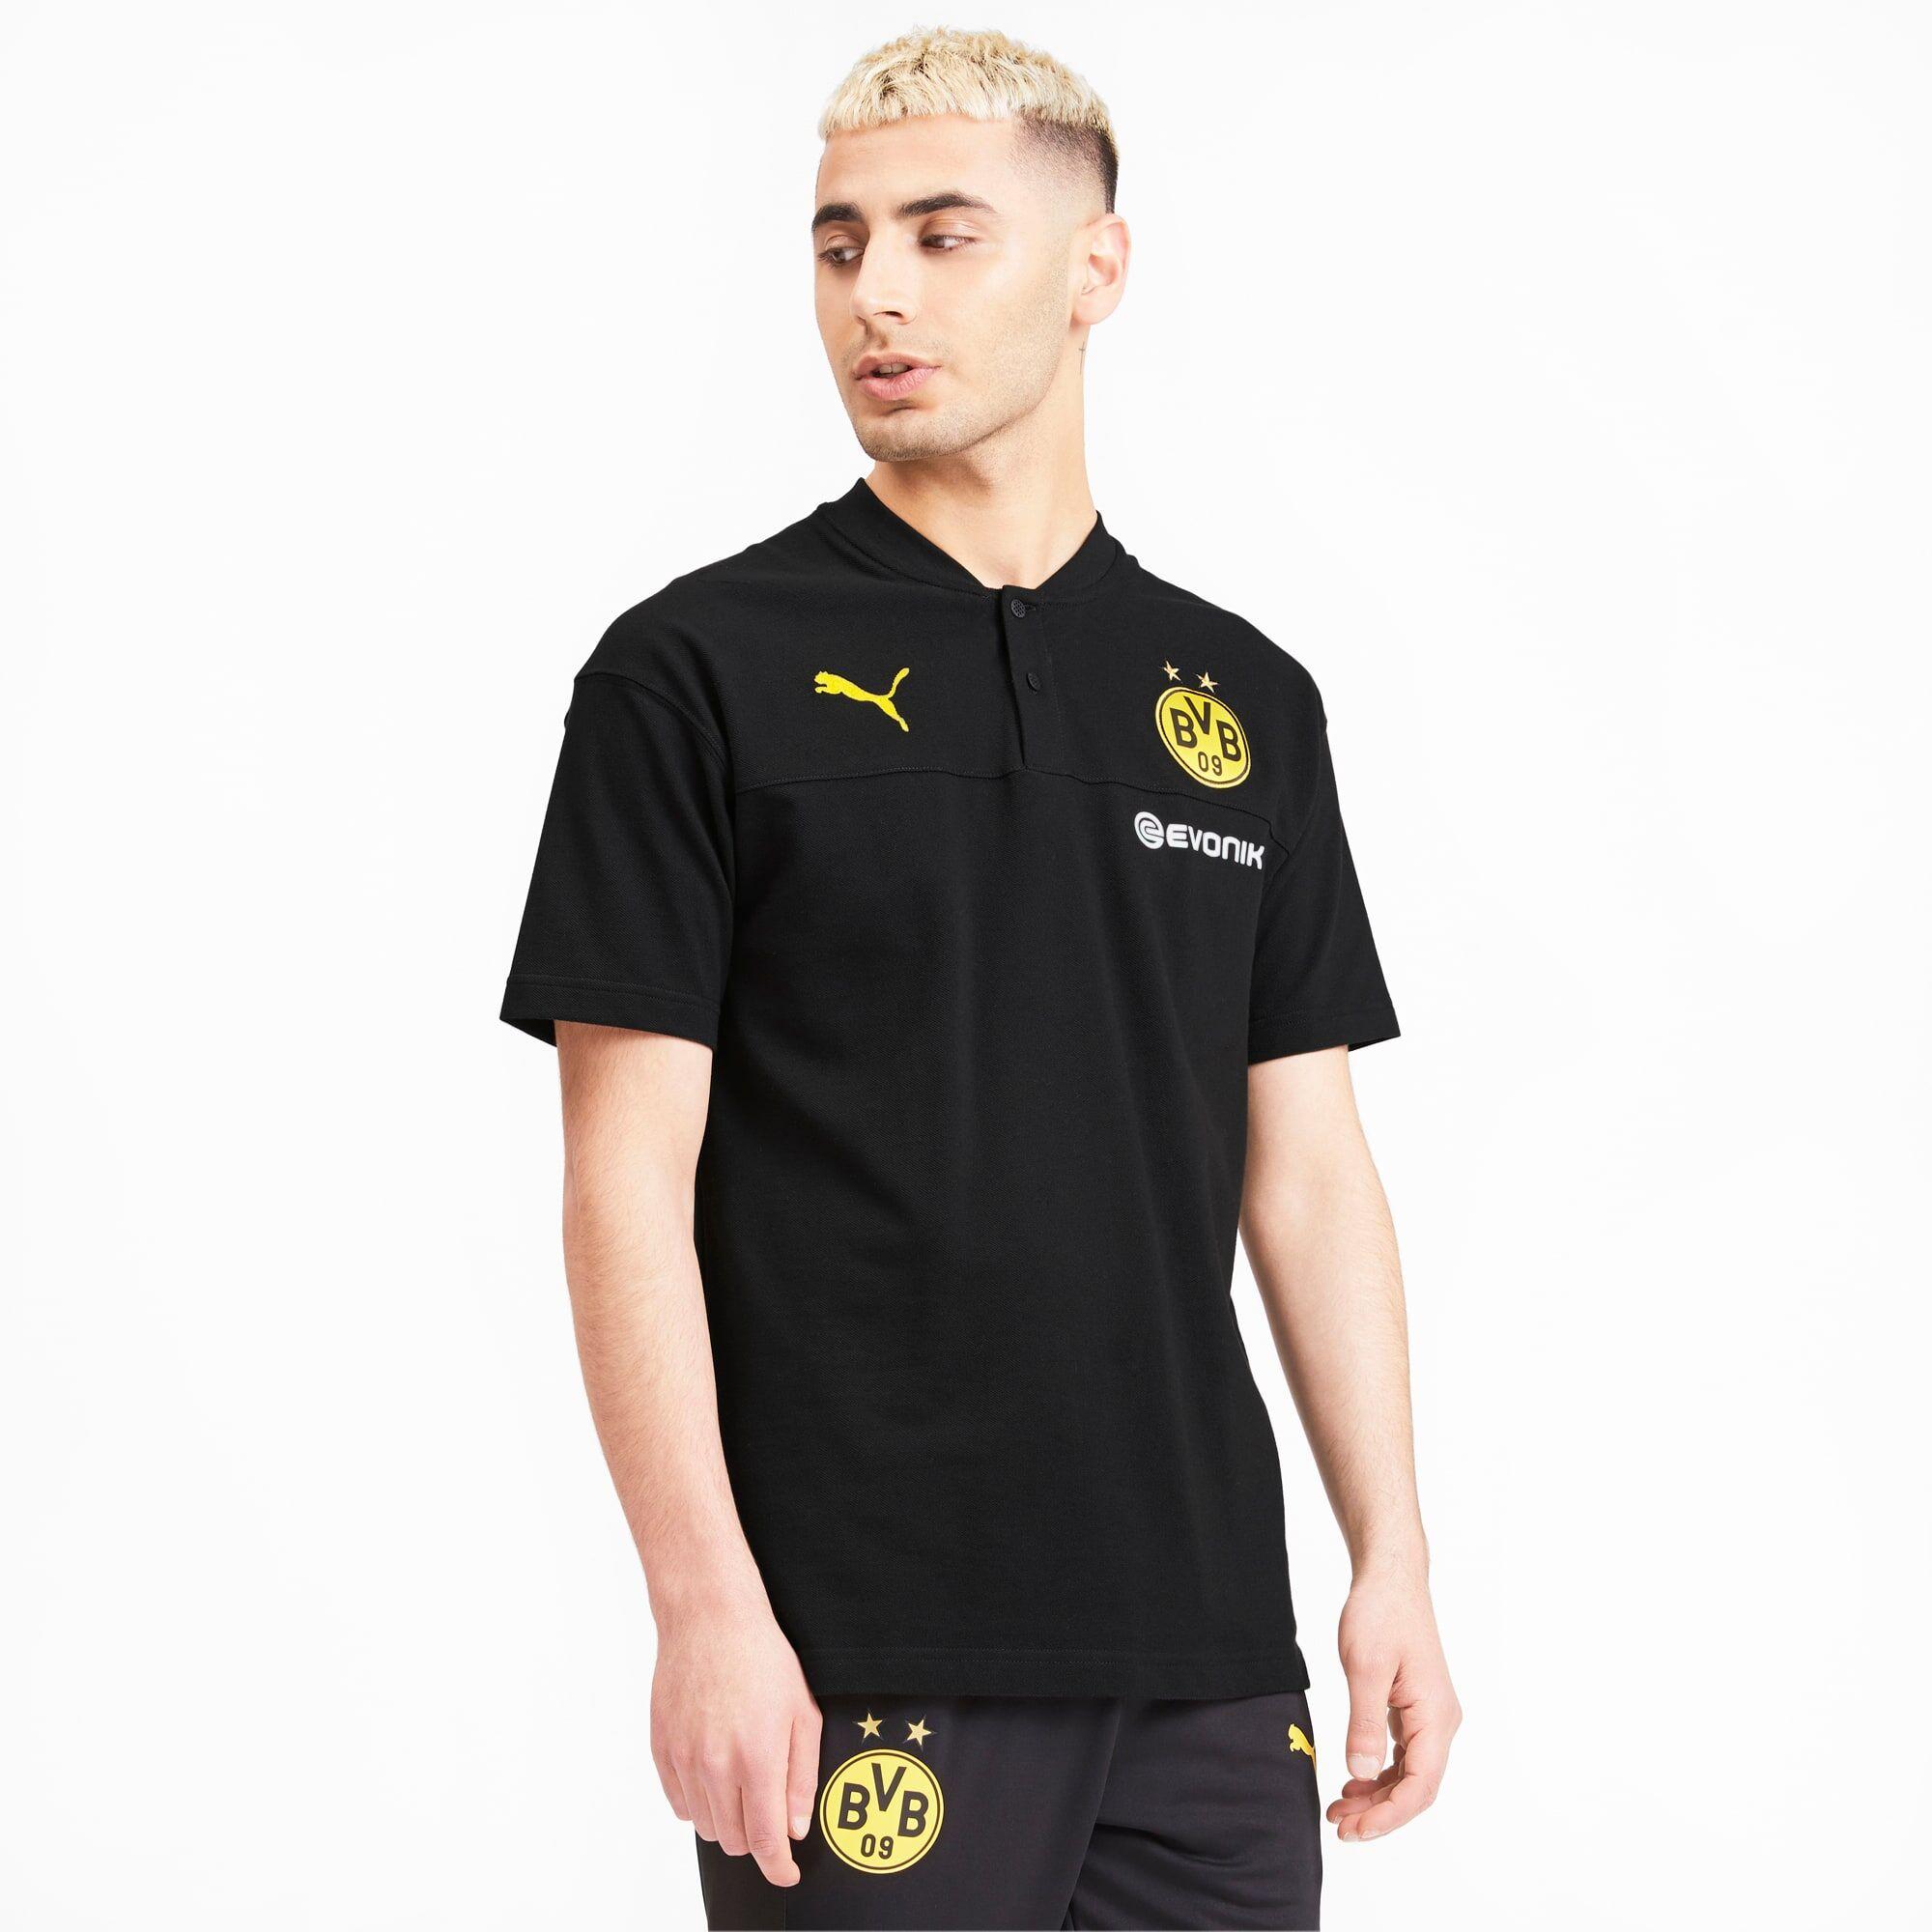 Puma BVB Casuals Men's Polo Shirt,  Black/Phantom Black, size X Large, Clothing